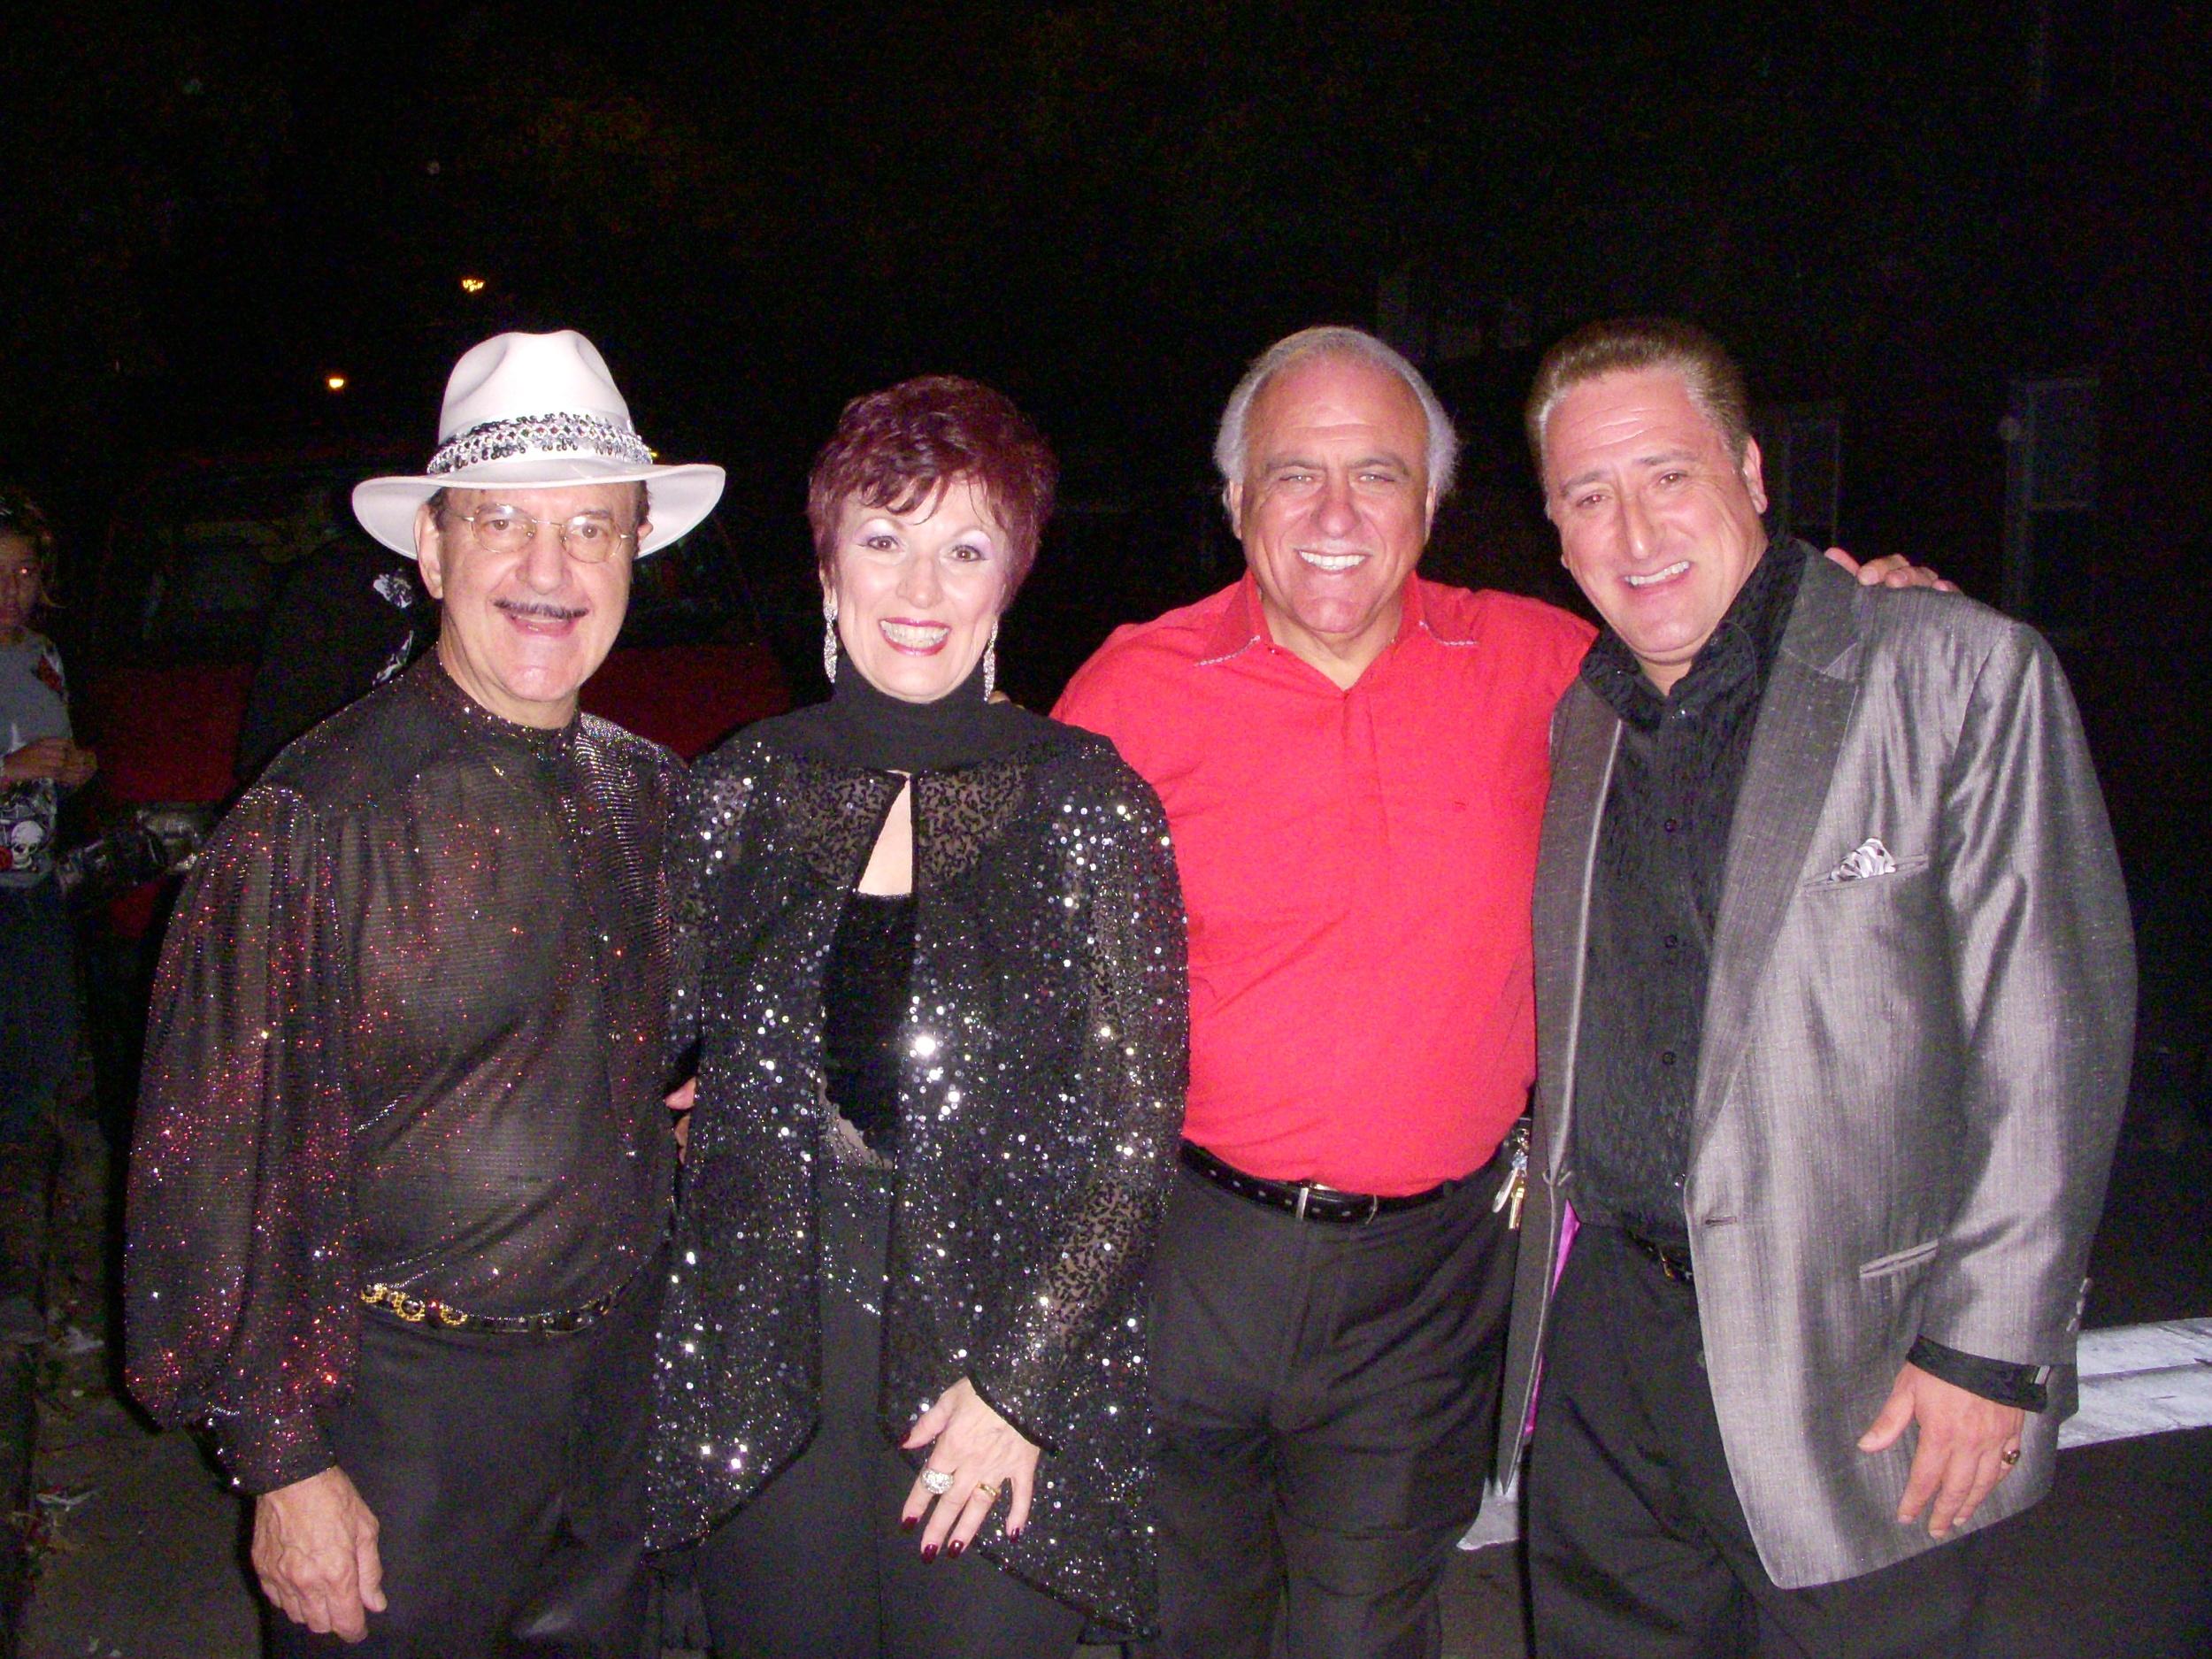 Mario Tacca, Mary Mancini, Nick Desiderio, Ray Gelato